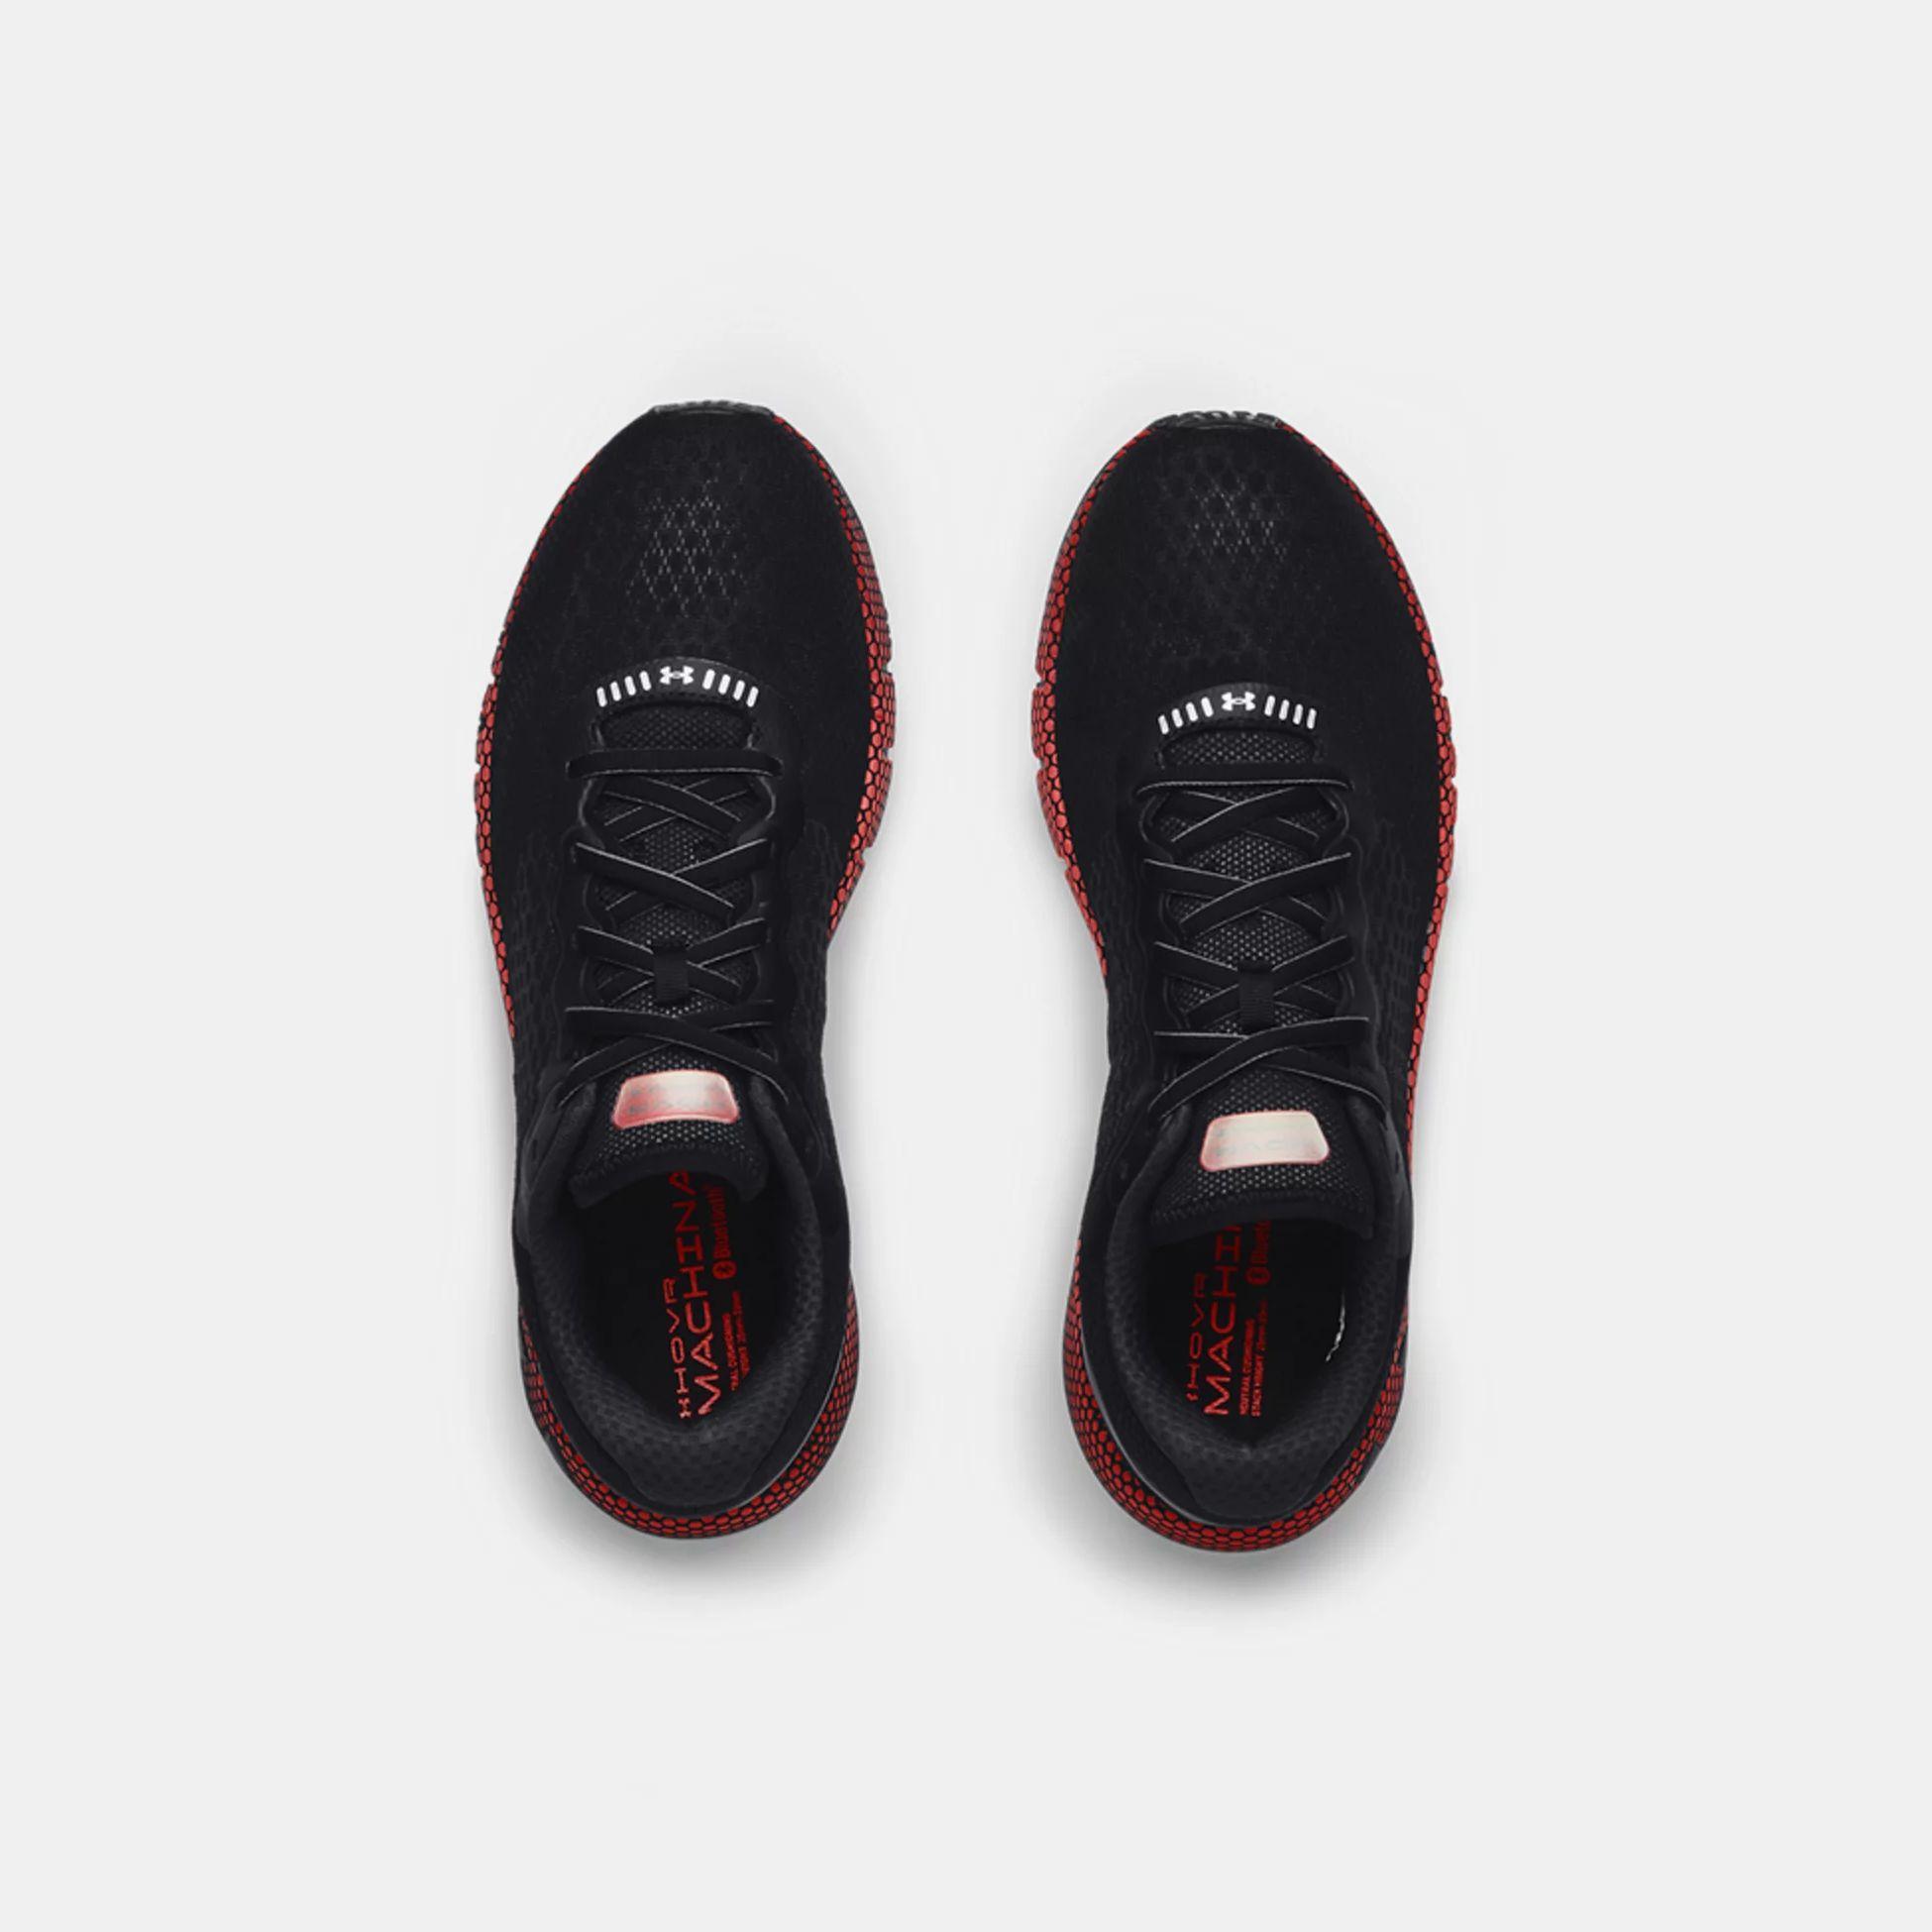 Încălțăminte -  under armour UA HOVR Machina 2 Colorshift Running Shoes